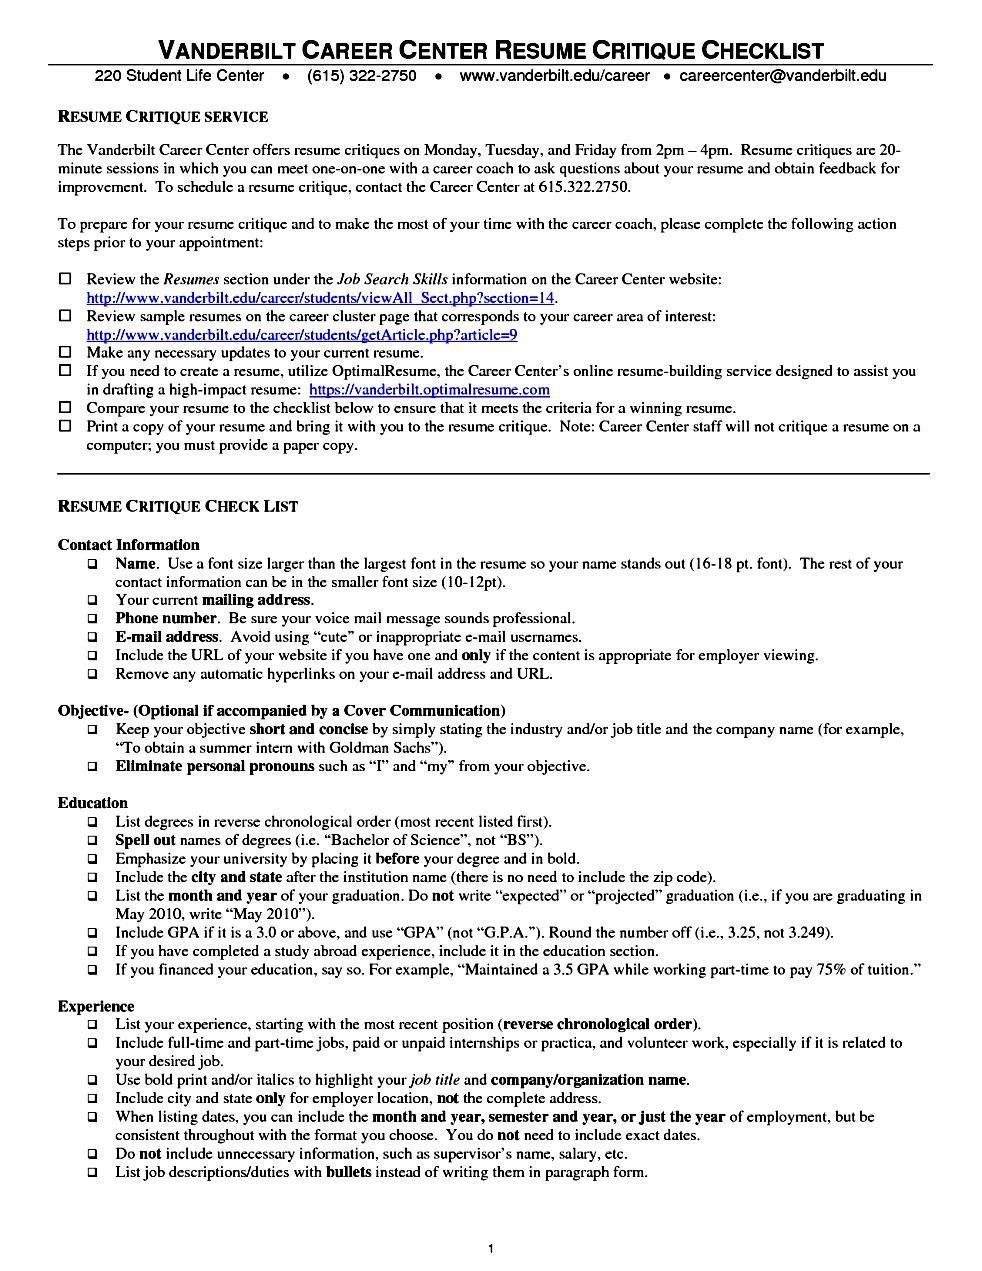 resume critique service